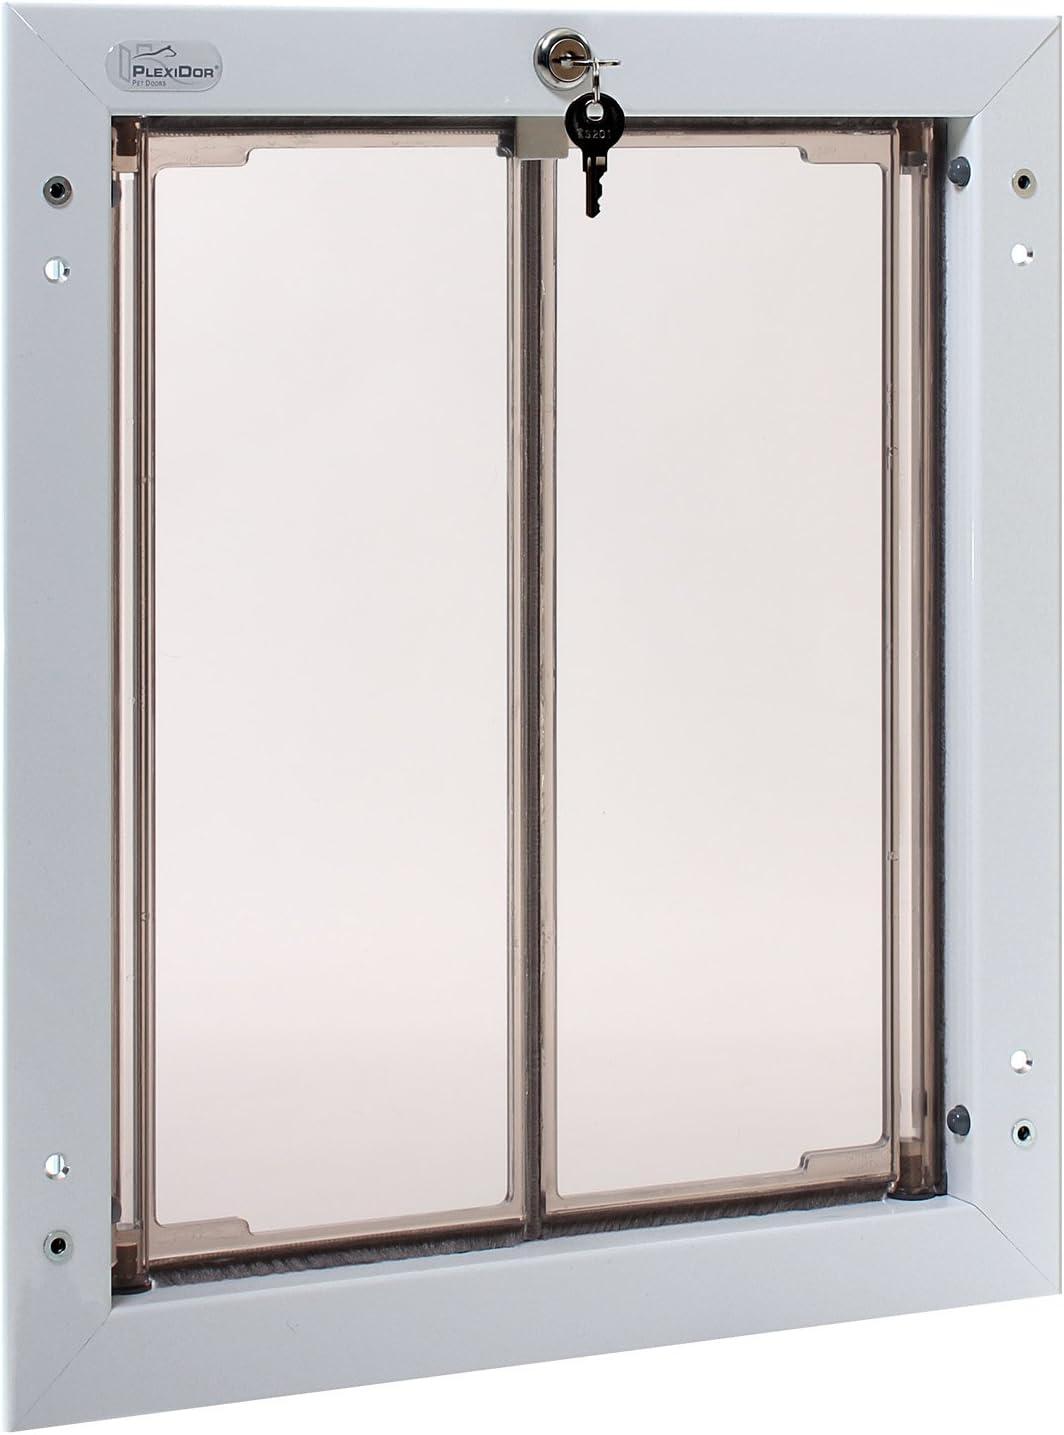 PlexiDor Performance Pet Doors Large White Door Mount by PlexiDor Performance Pet Doors